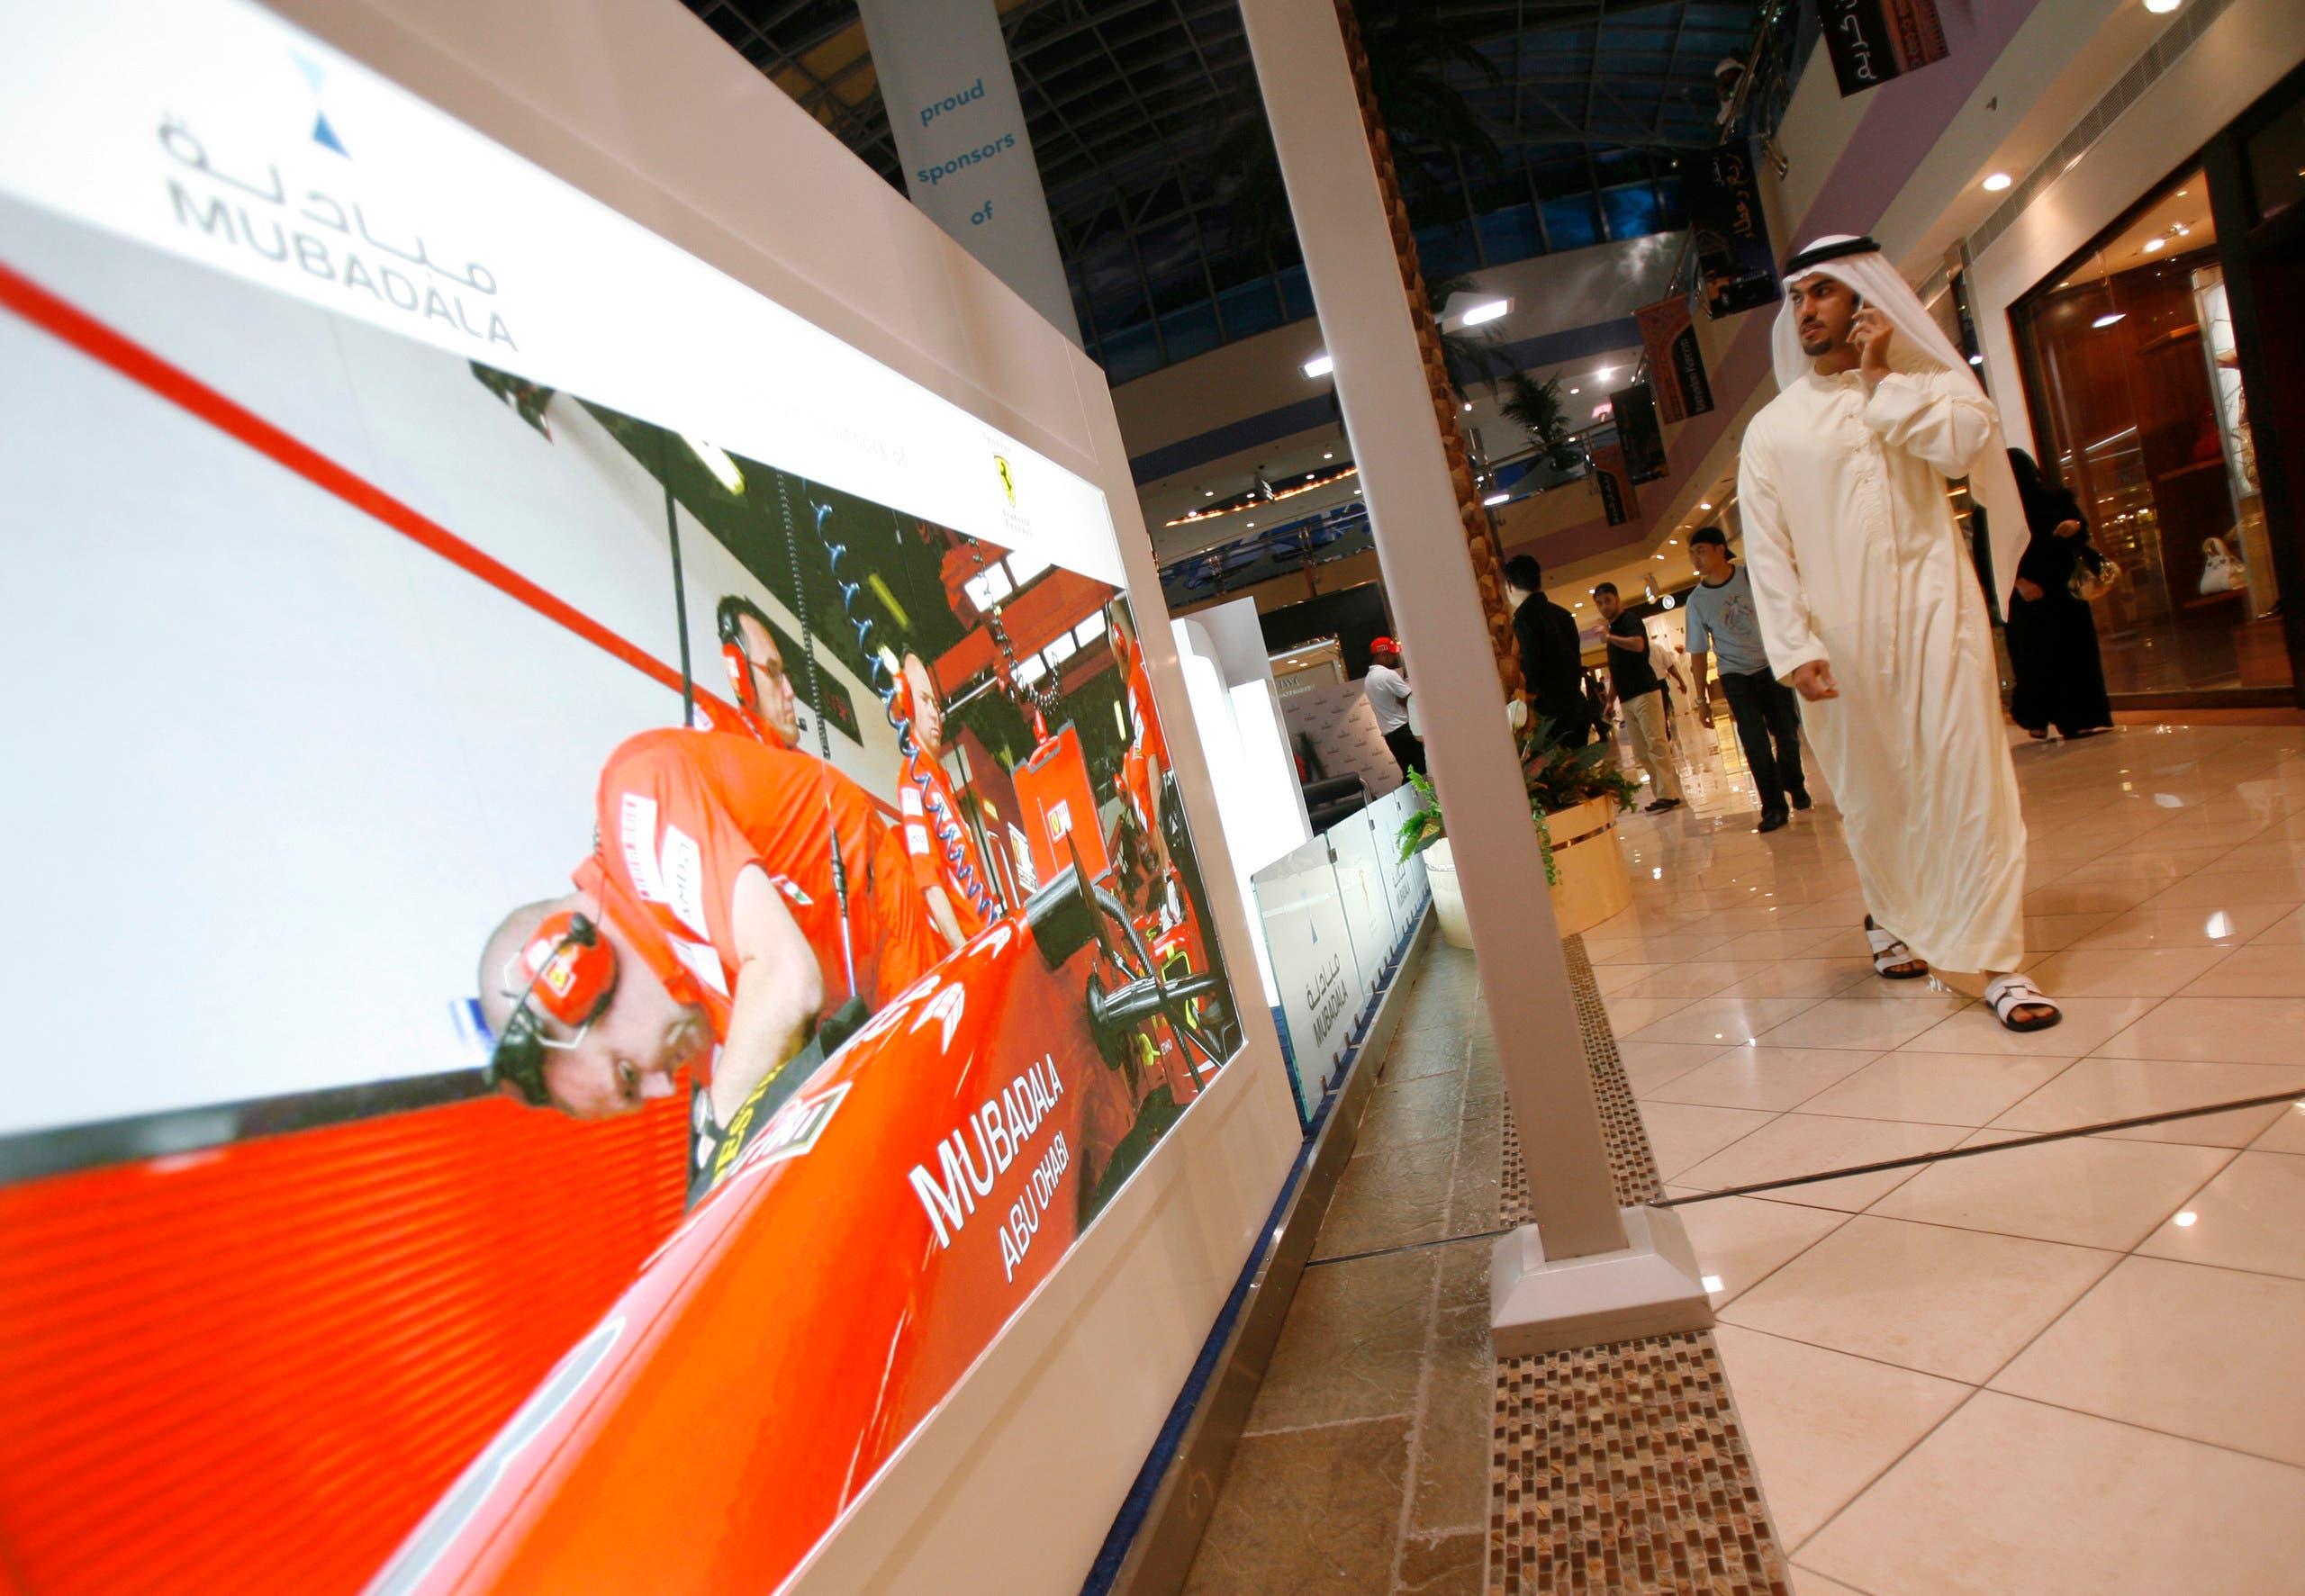 A man walks in Marina Mall in Abu Dhabi, UAE. (File photo: Reuters)